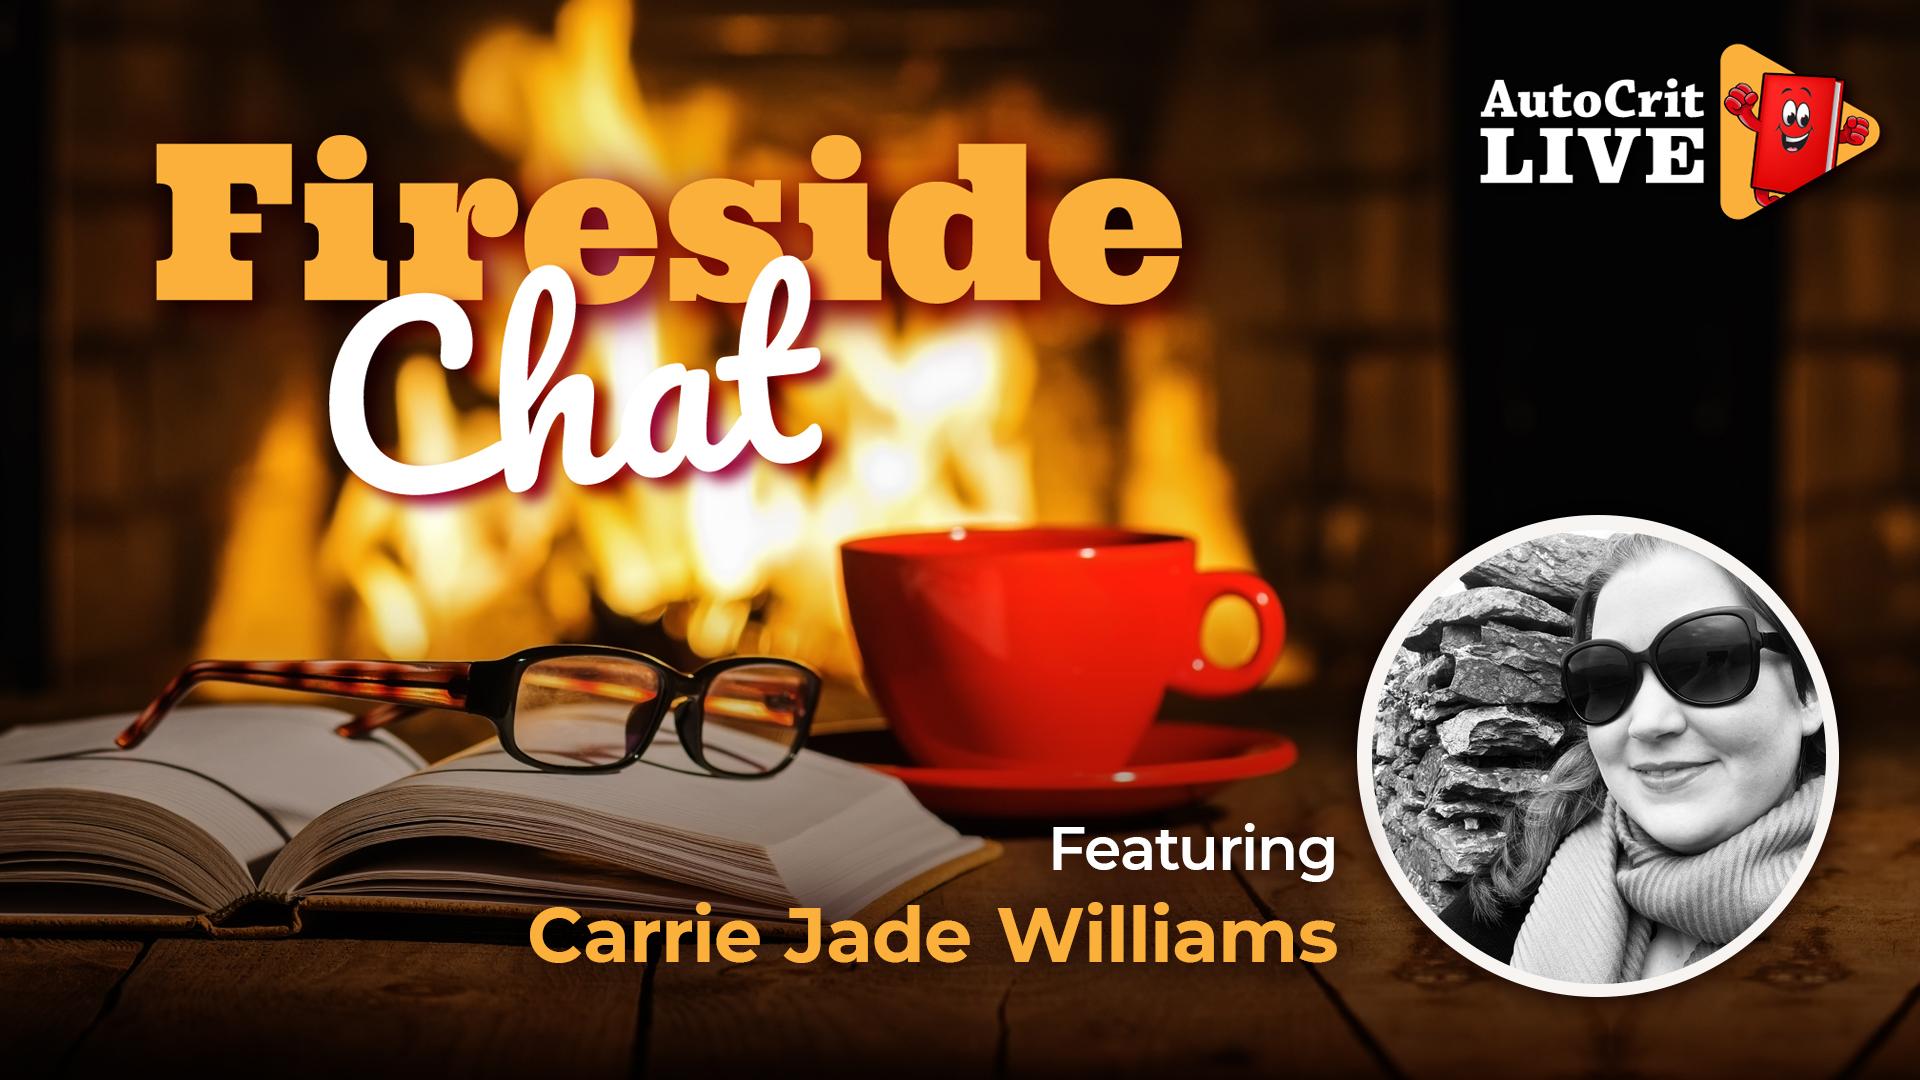 Carrie Jade